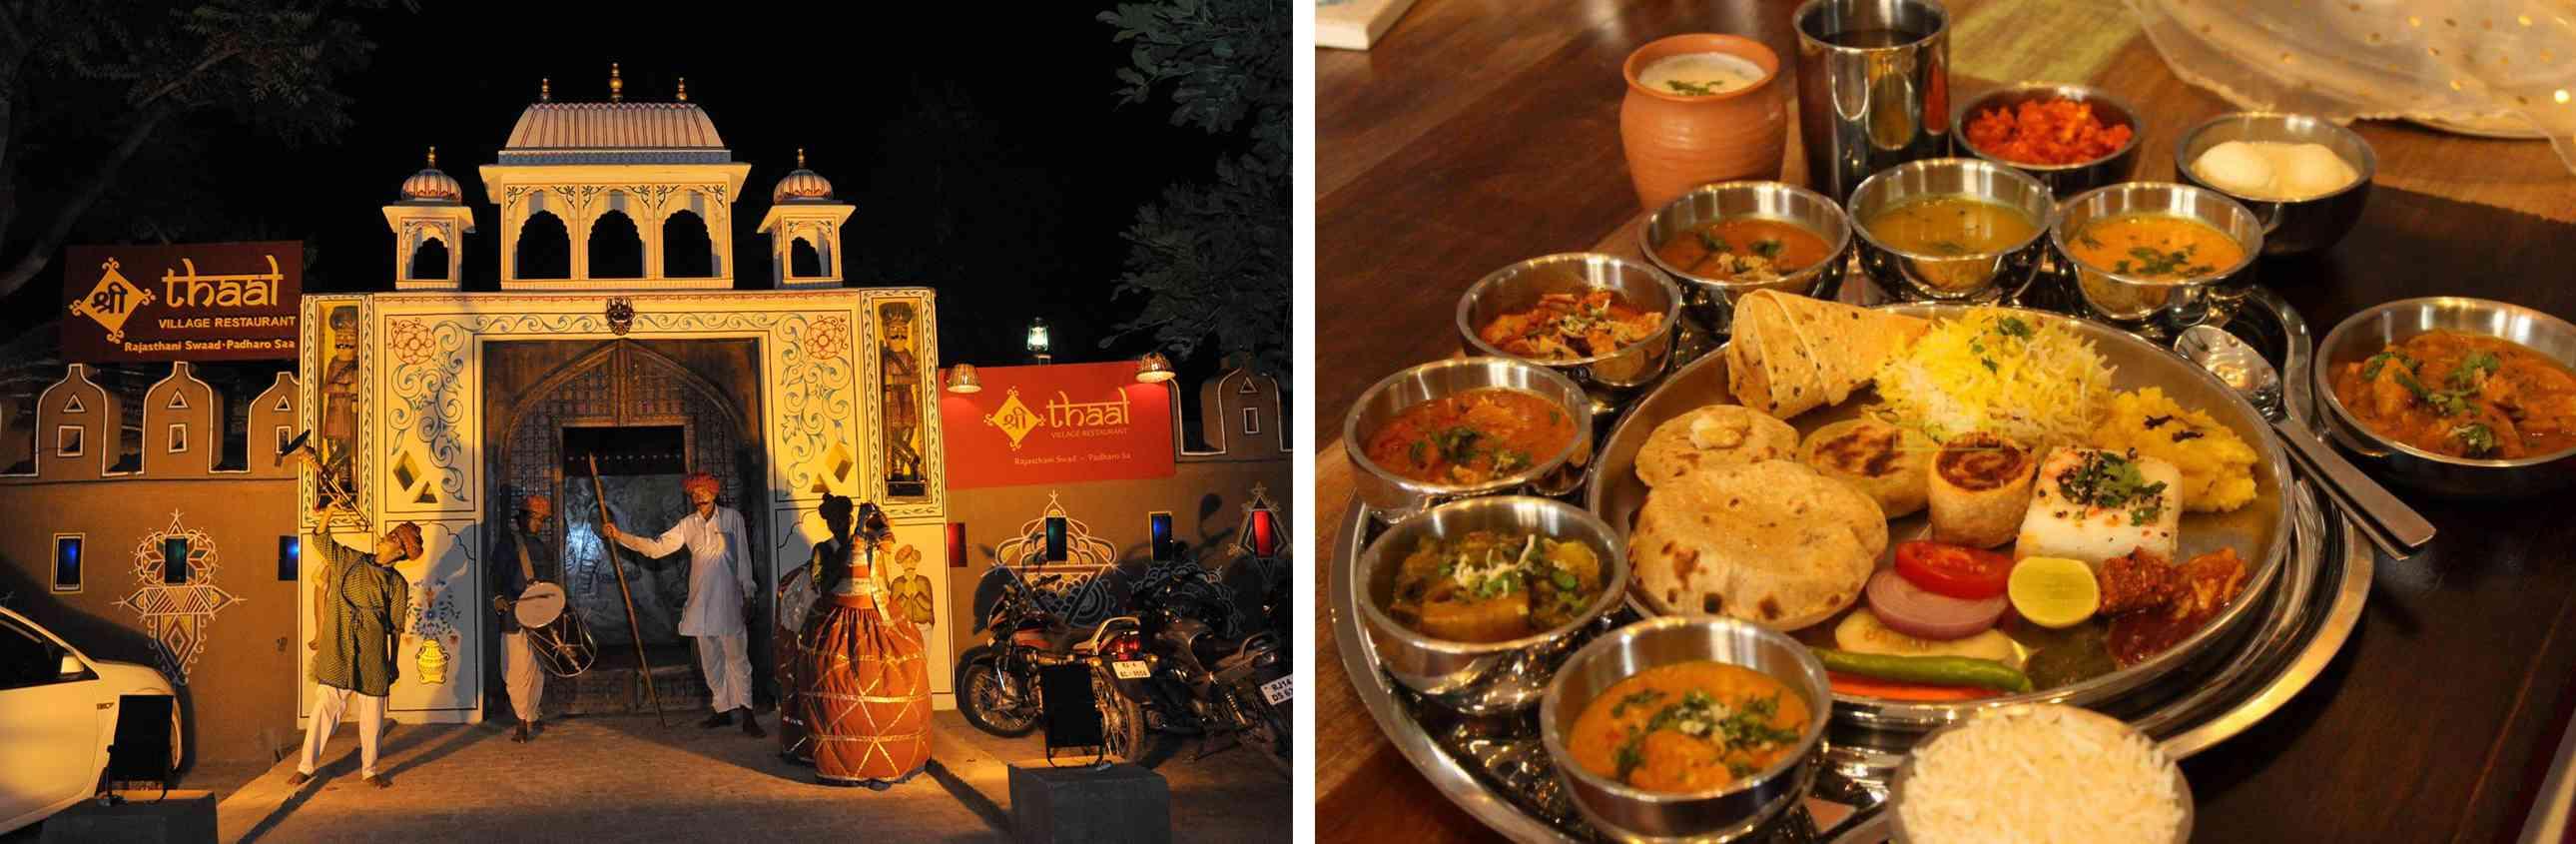 Rajasthani Thali Shri Thaal Village Restaurant